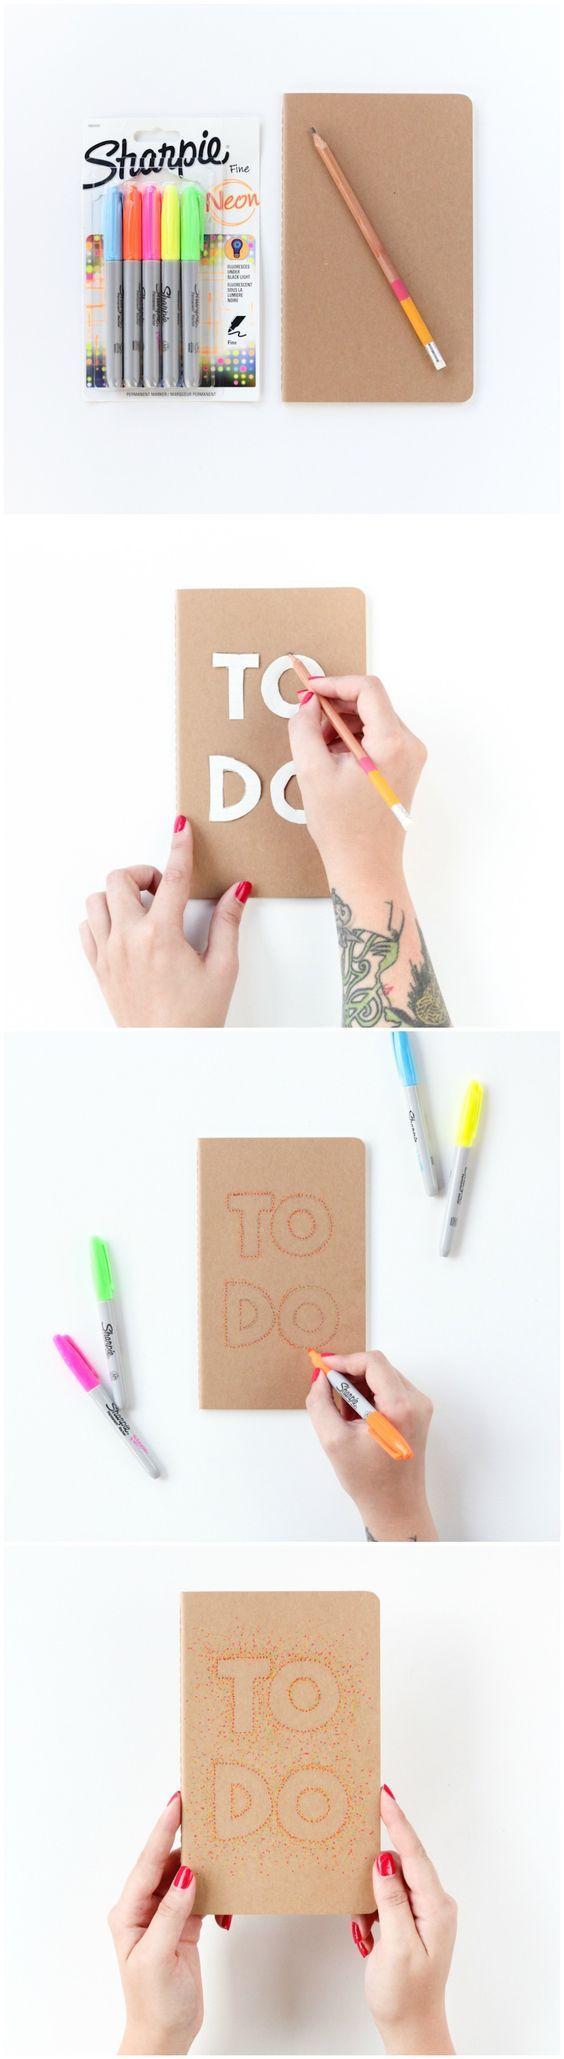 Como decorar libretas estilo tumblr